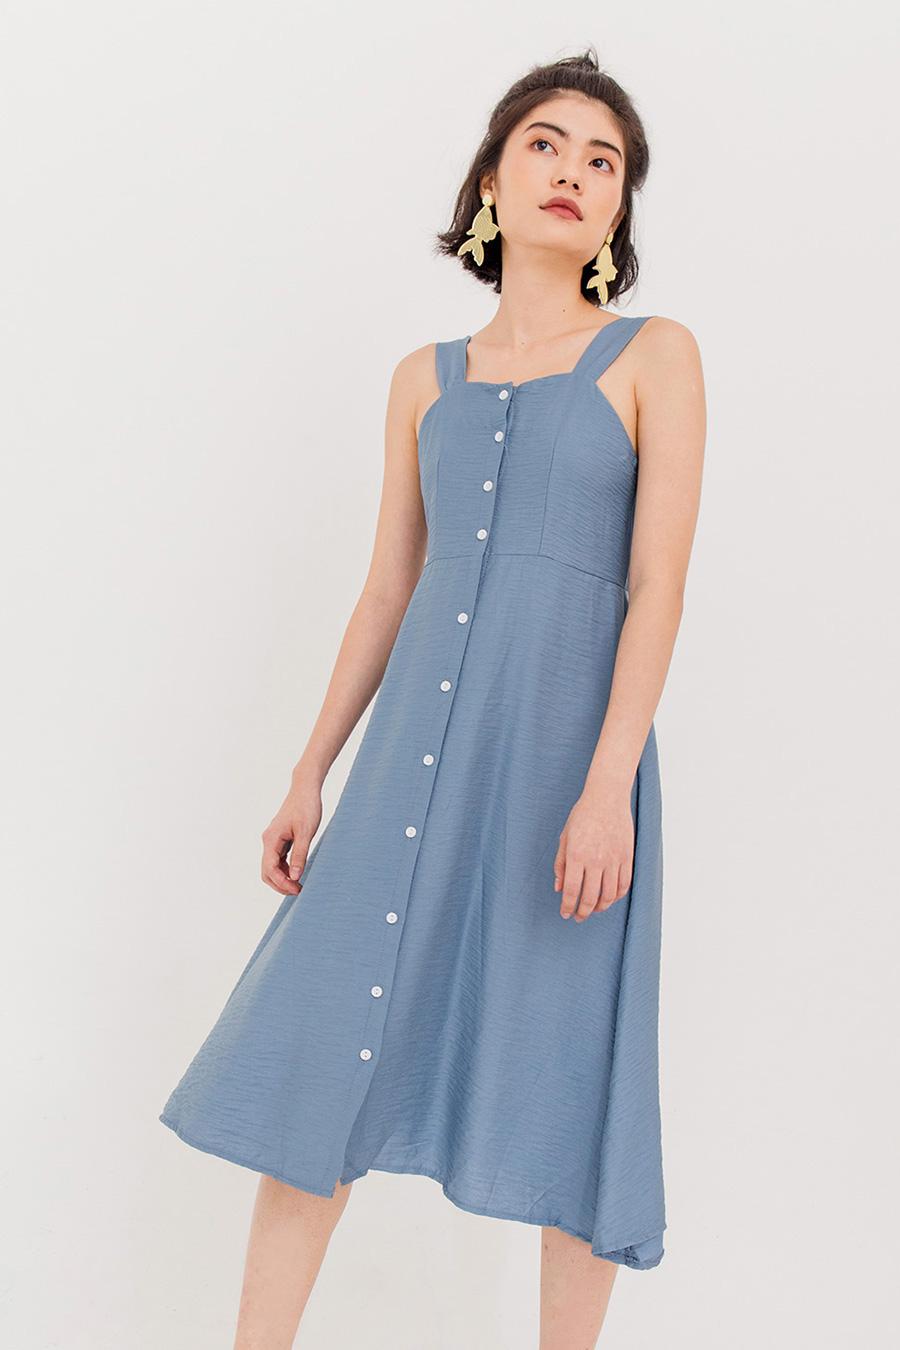 GRETA BUTTON DOWN MIDI DRESS - BLUE